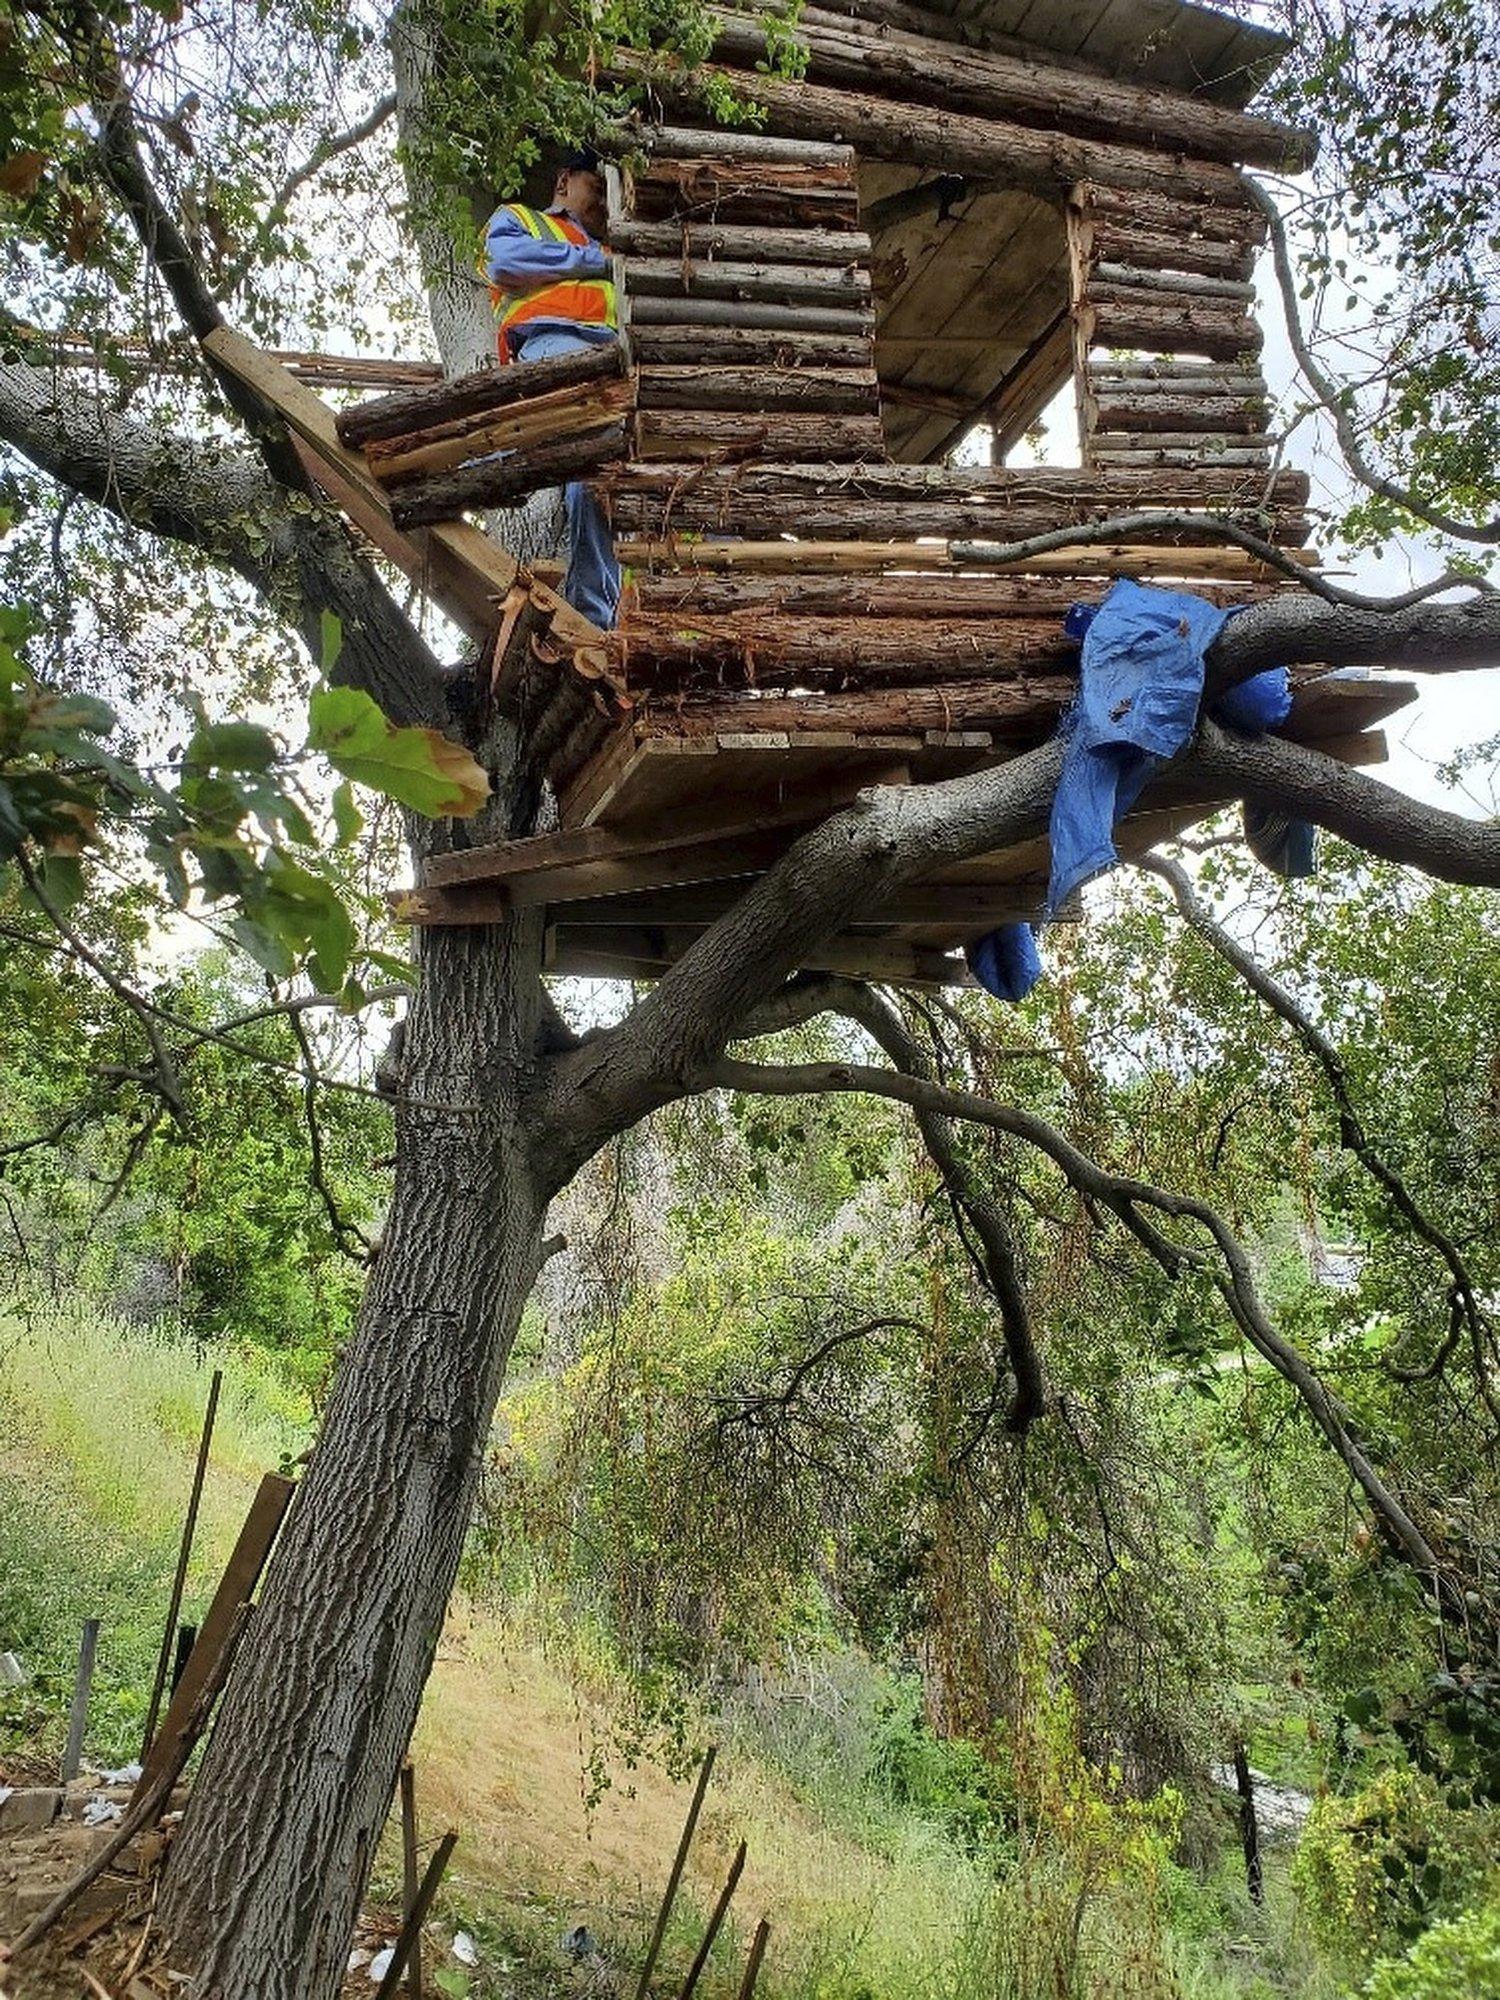 Burglary suspect found living in 'modern' treehouse